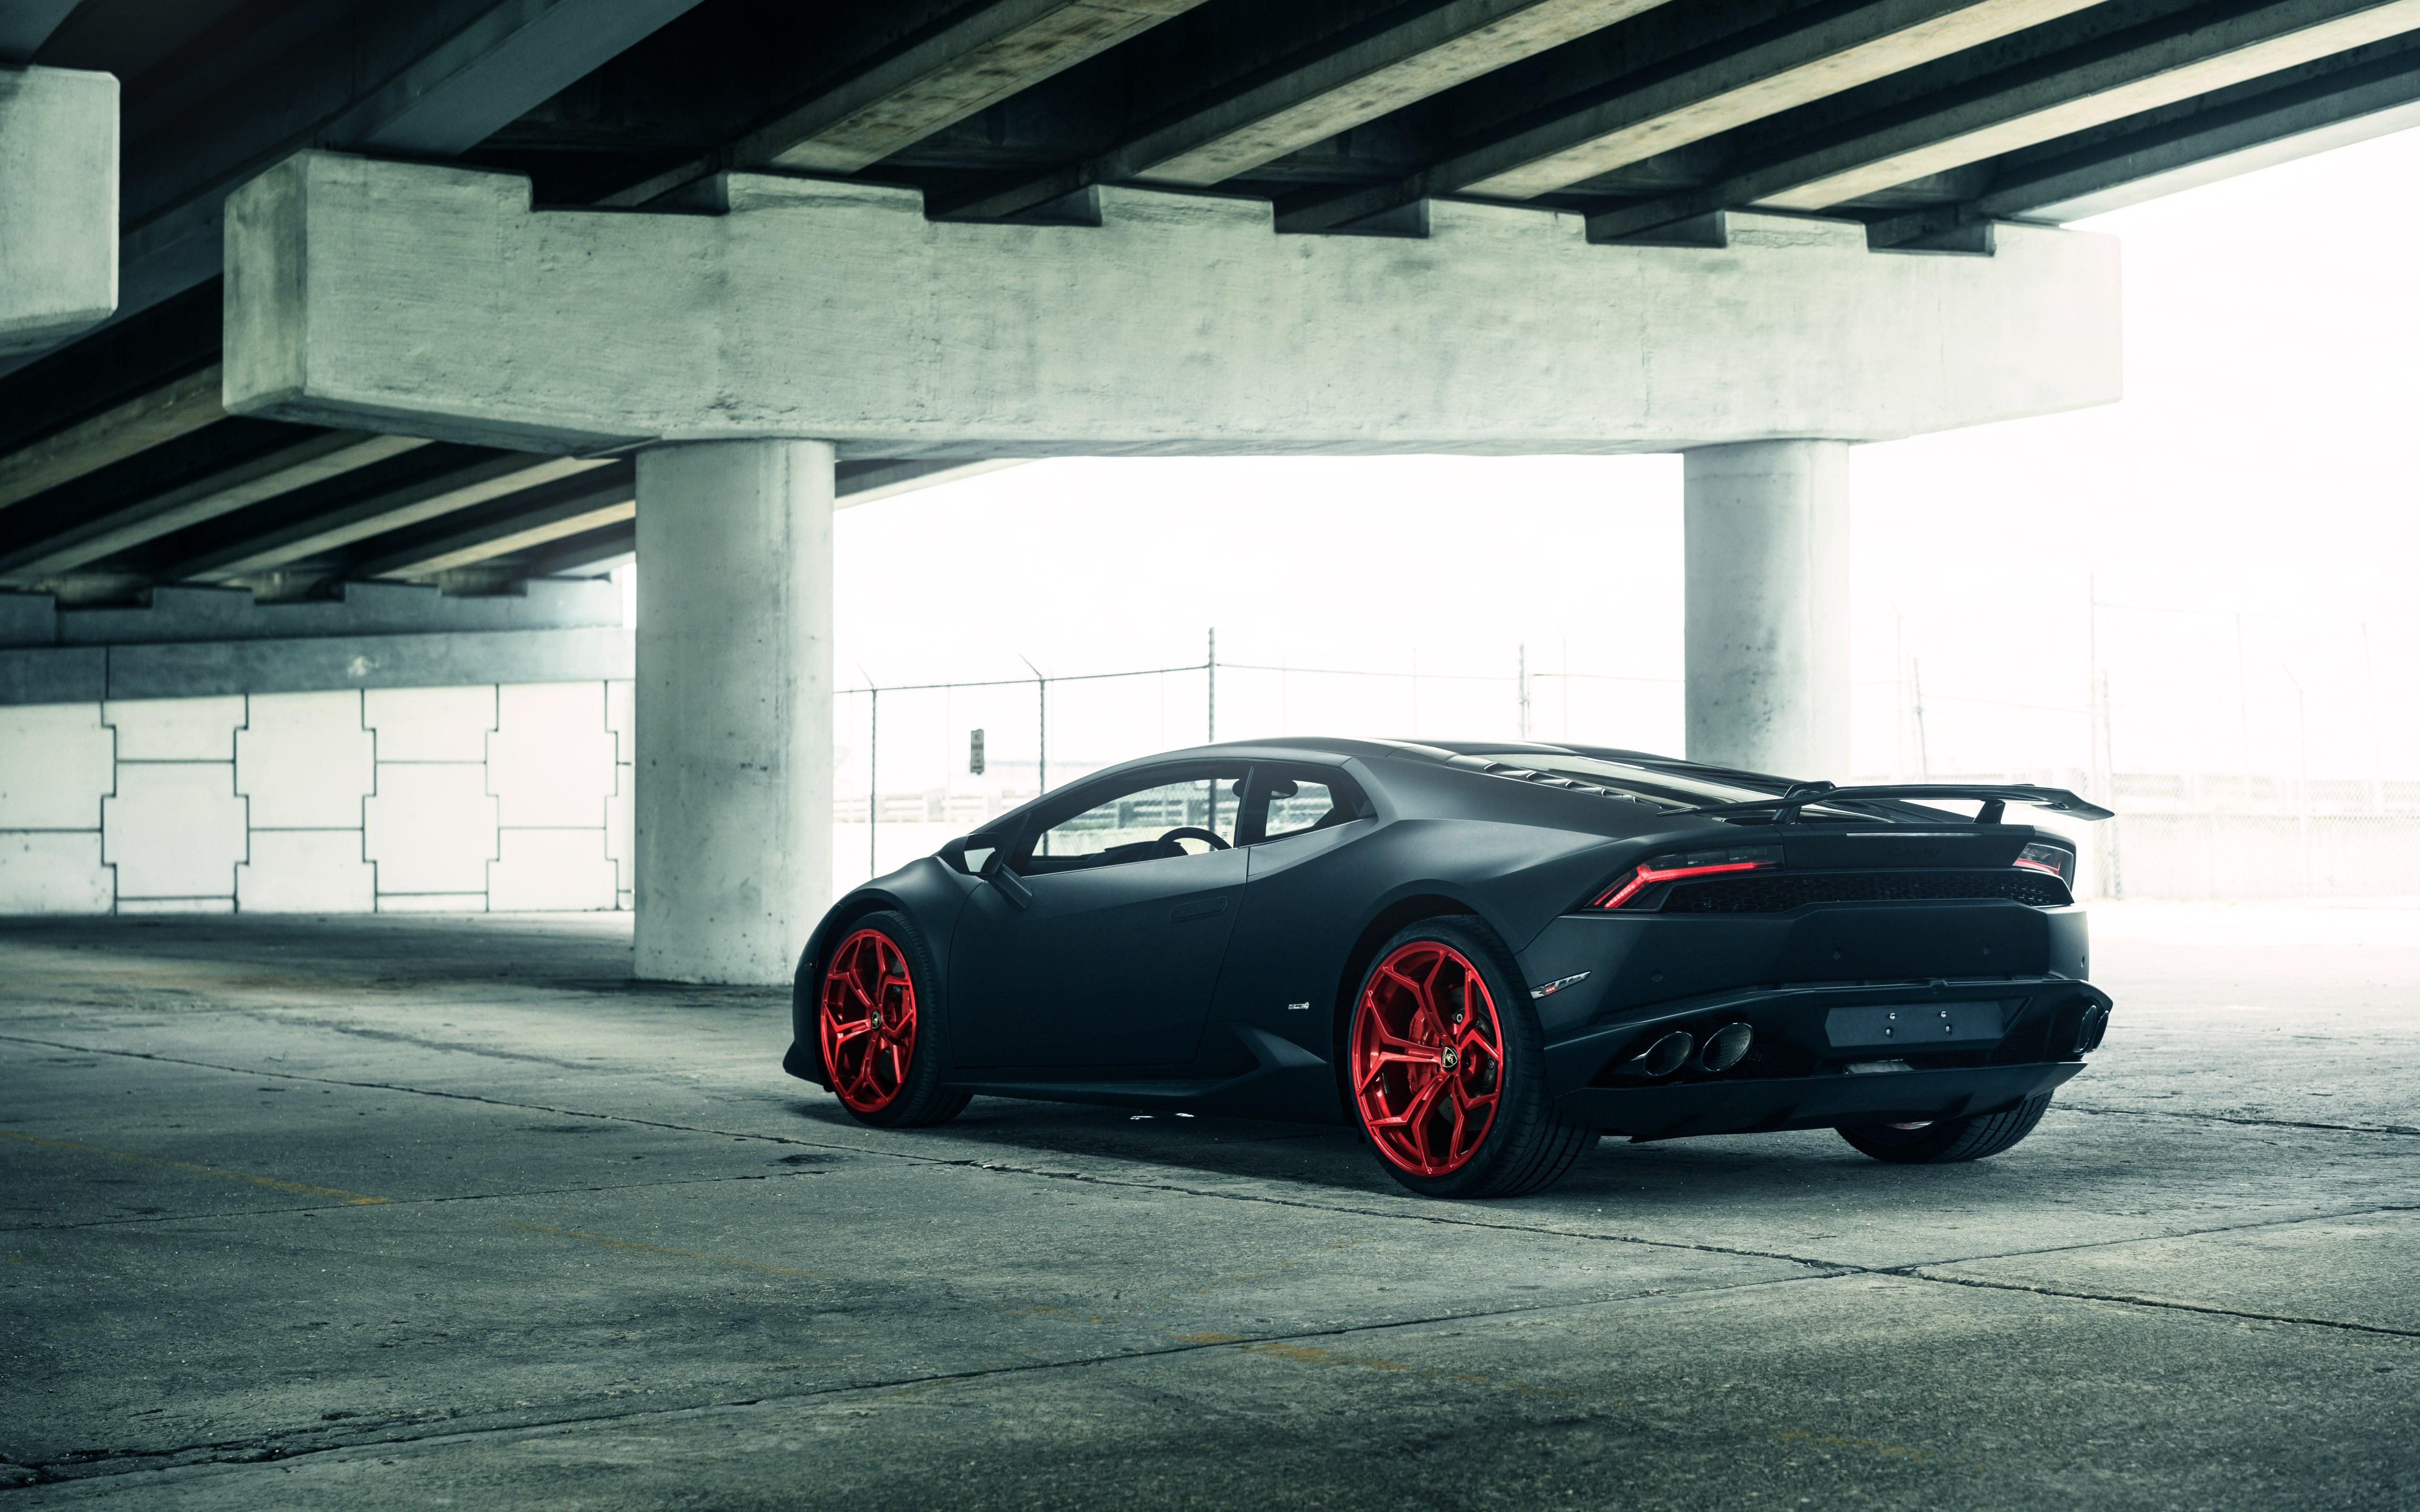 Download Wallpaper Vellano Matte Black Lamborghini Huracan On Red 3